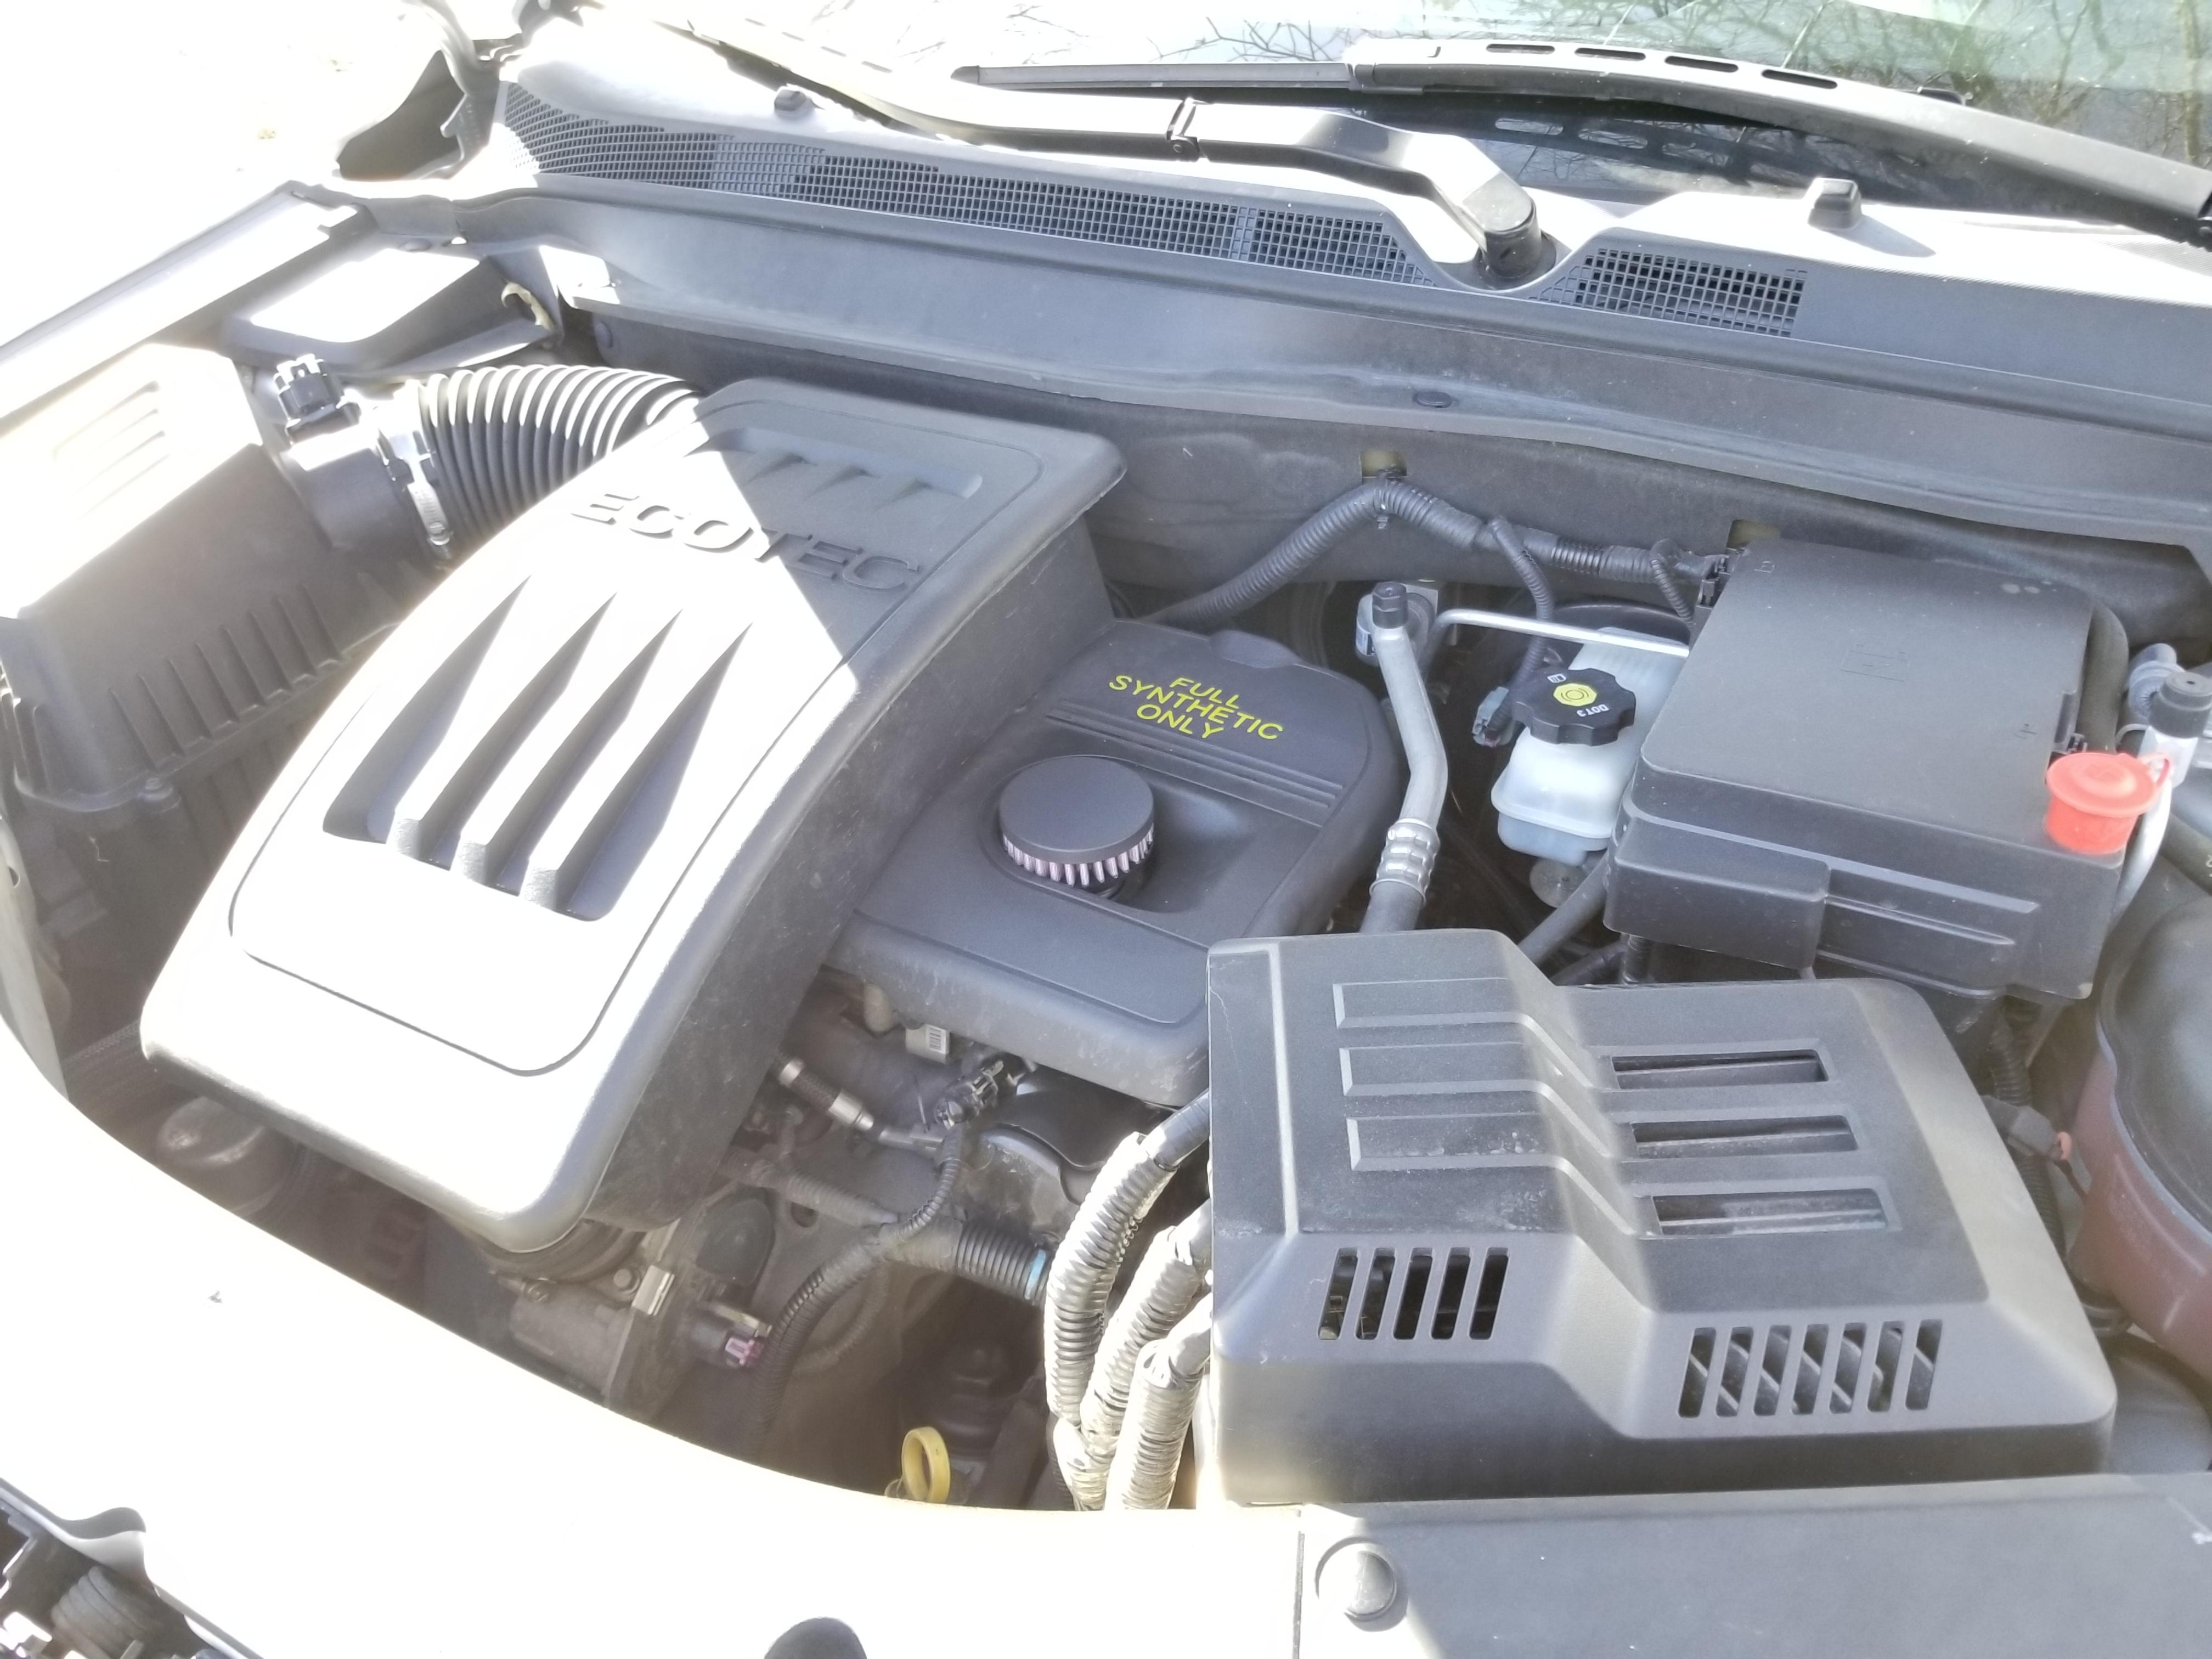 GM Service Bulletin 14882 - Blocked PCV valve causing Rear